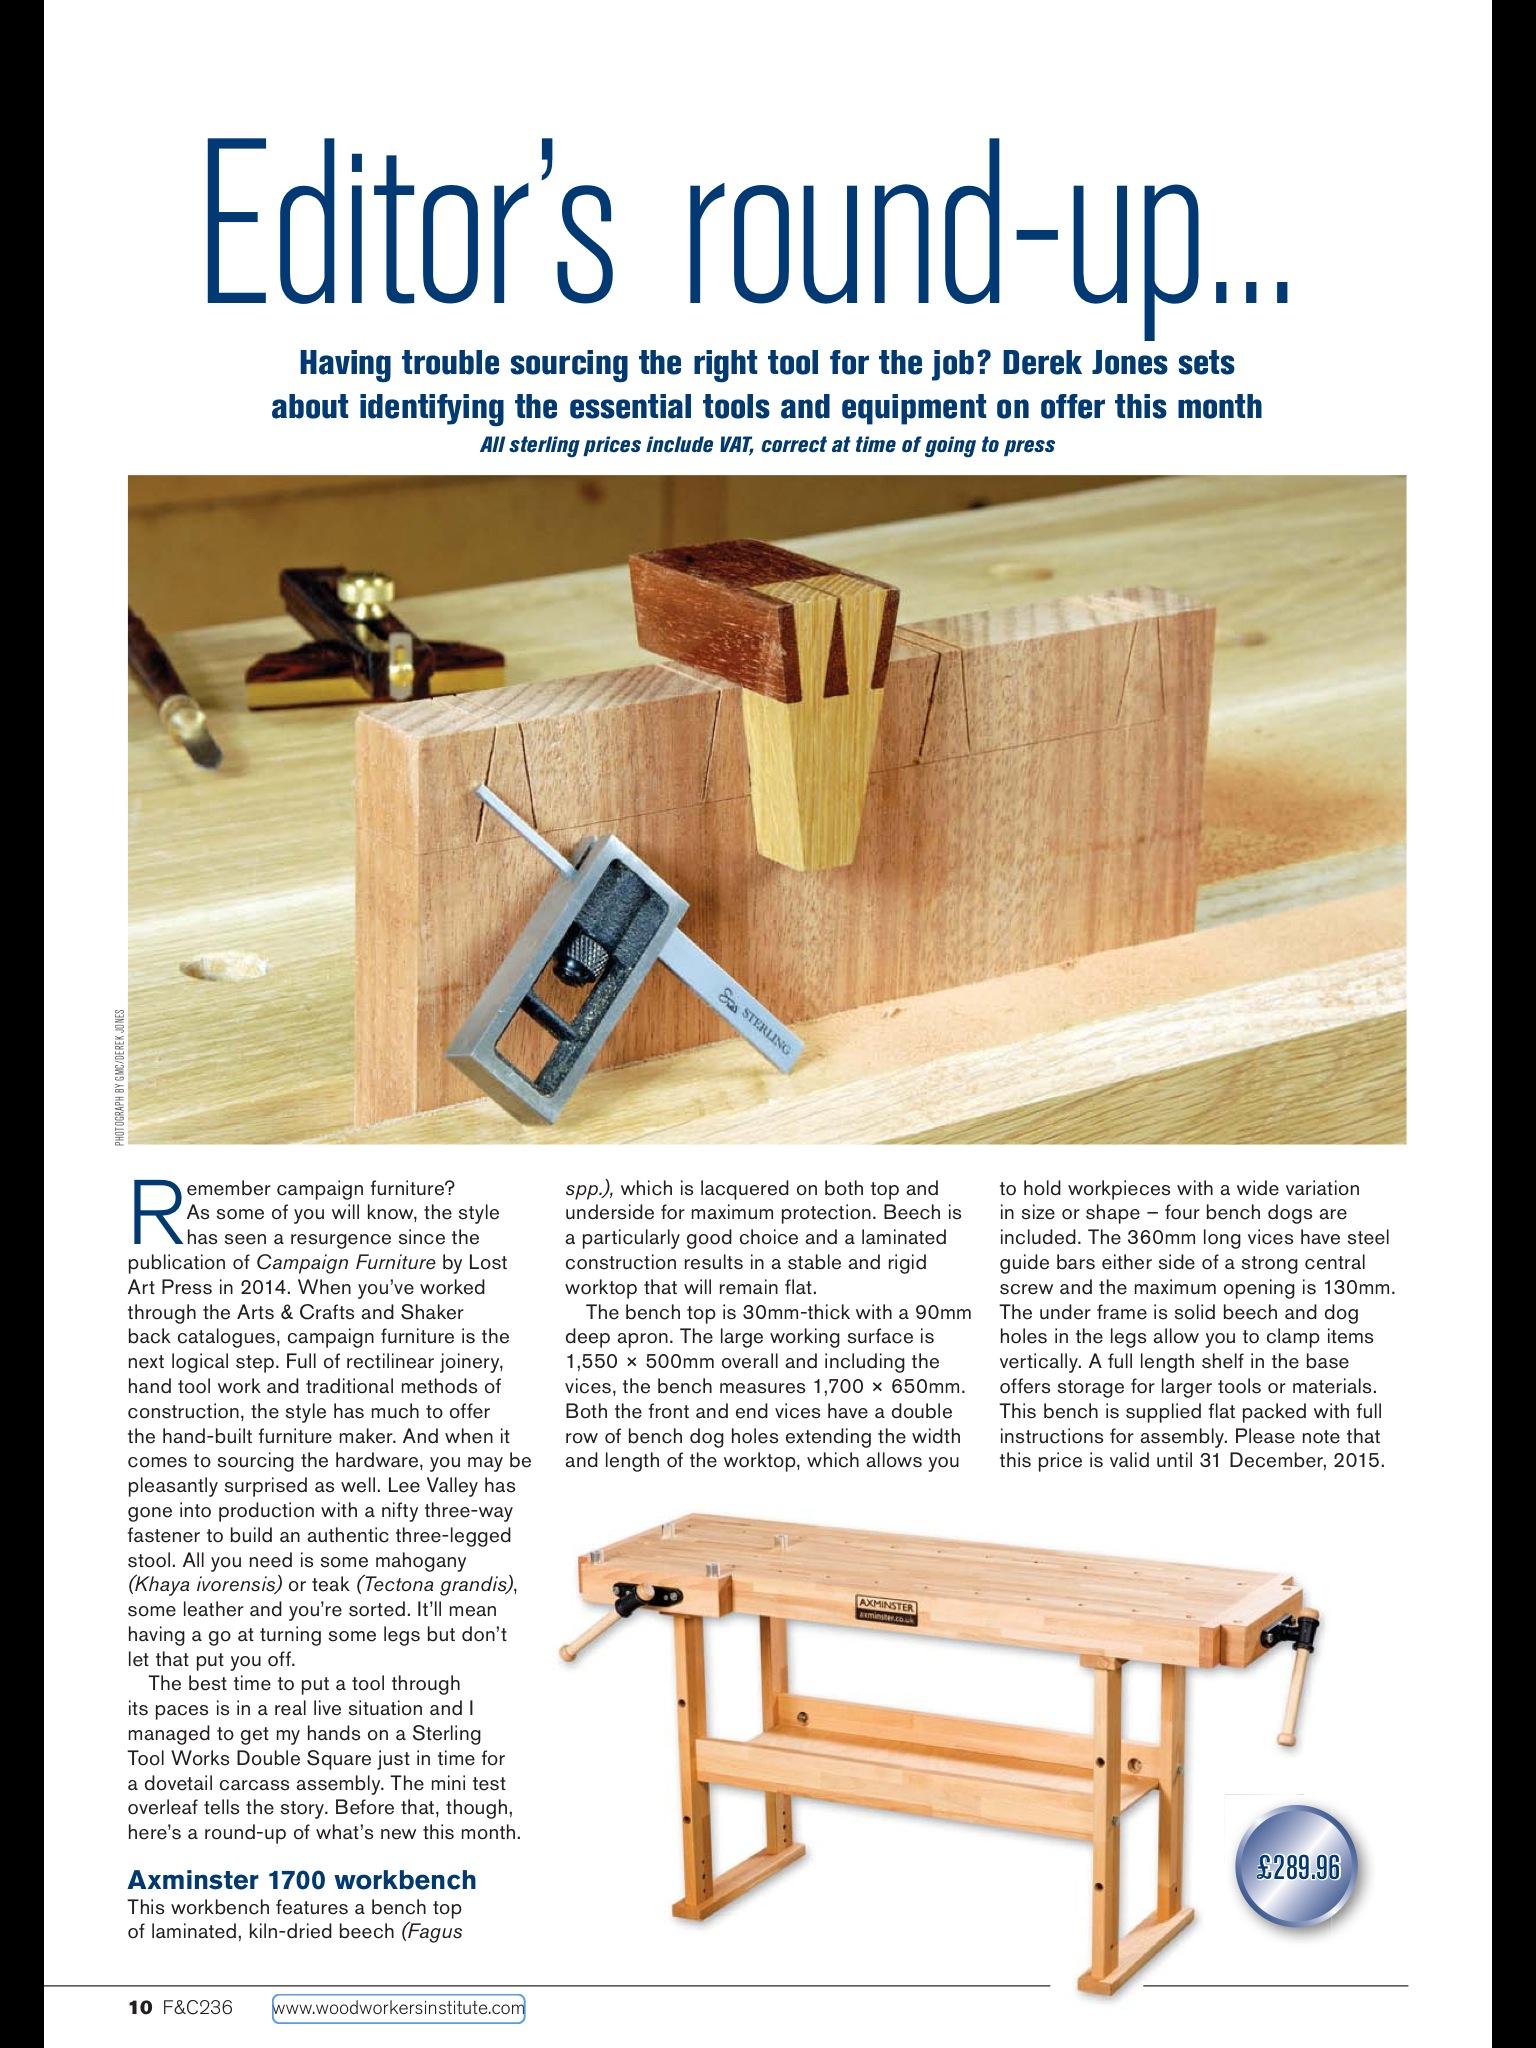 Jones And Jones Furniture Mini Test Of The Sterling Dovetail Square  Furniture